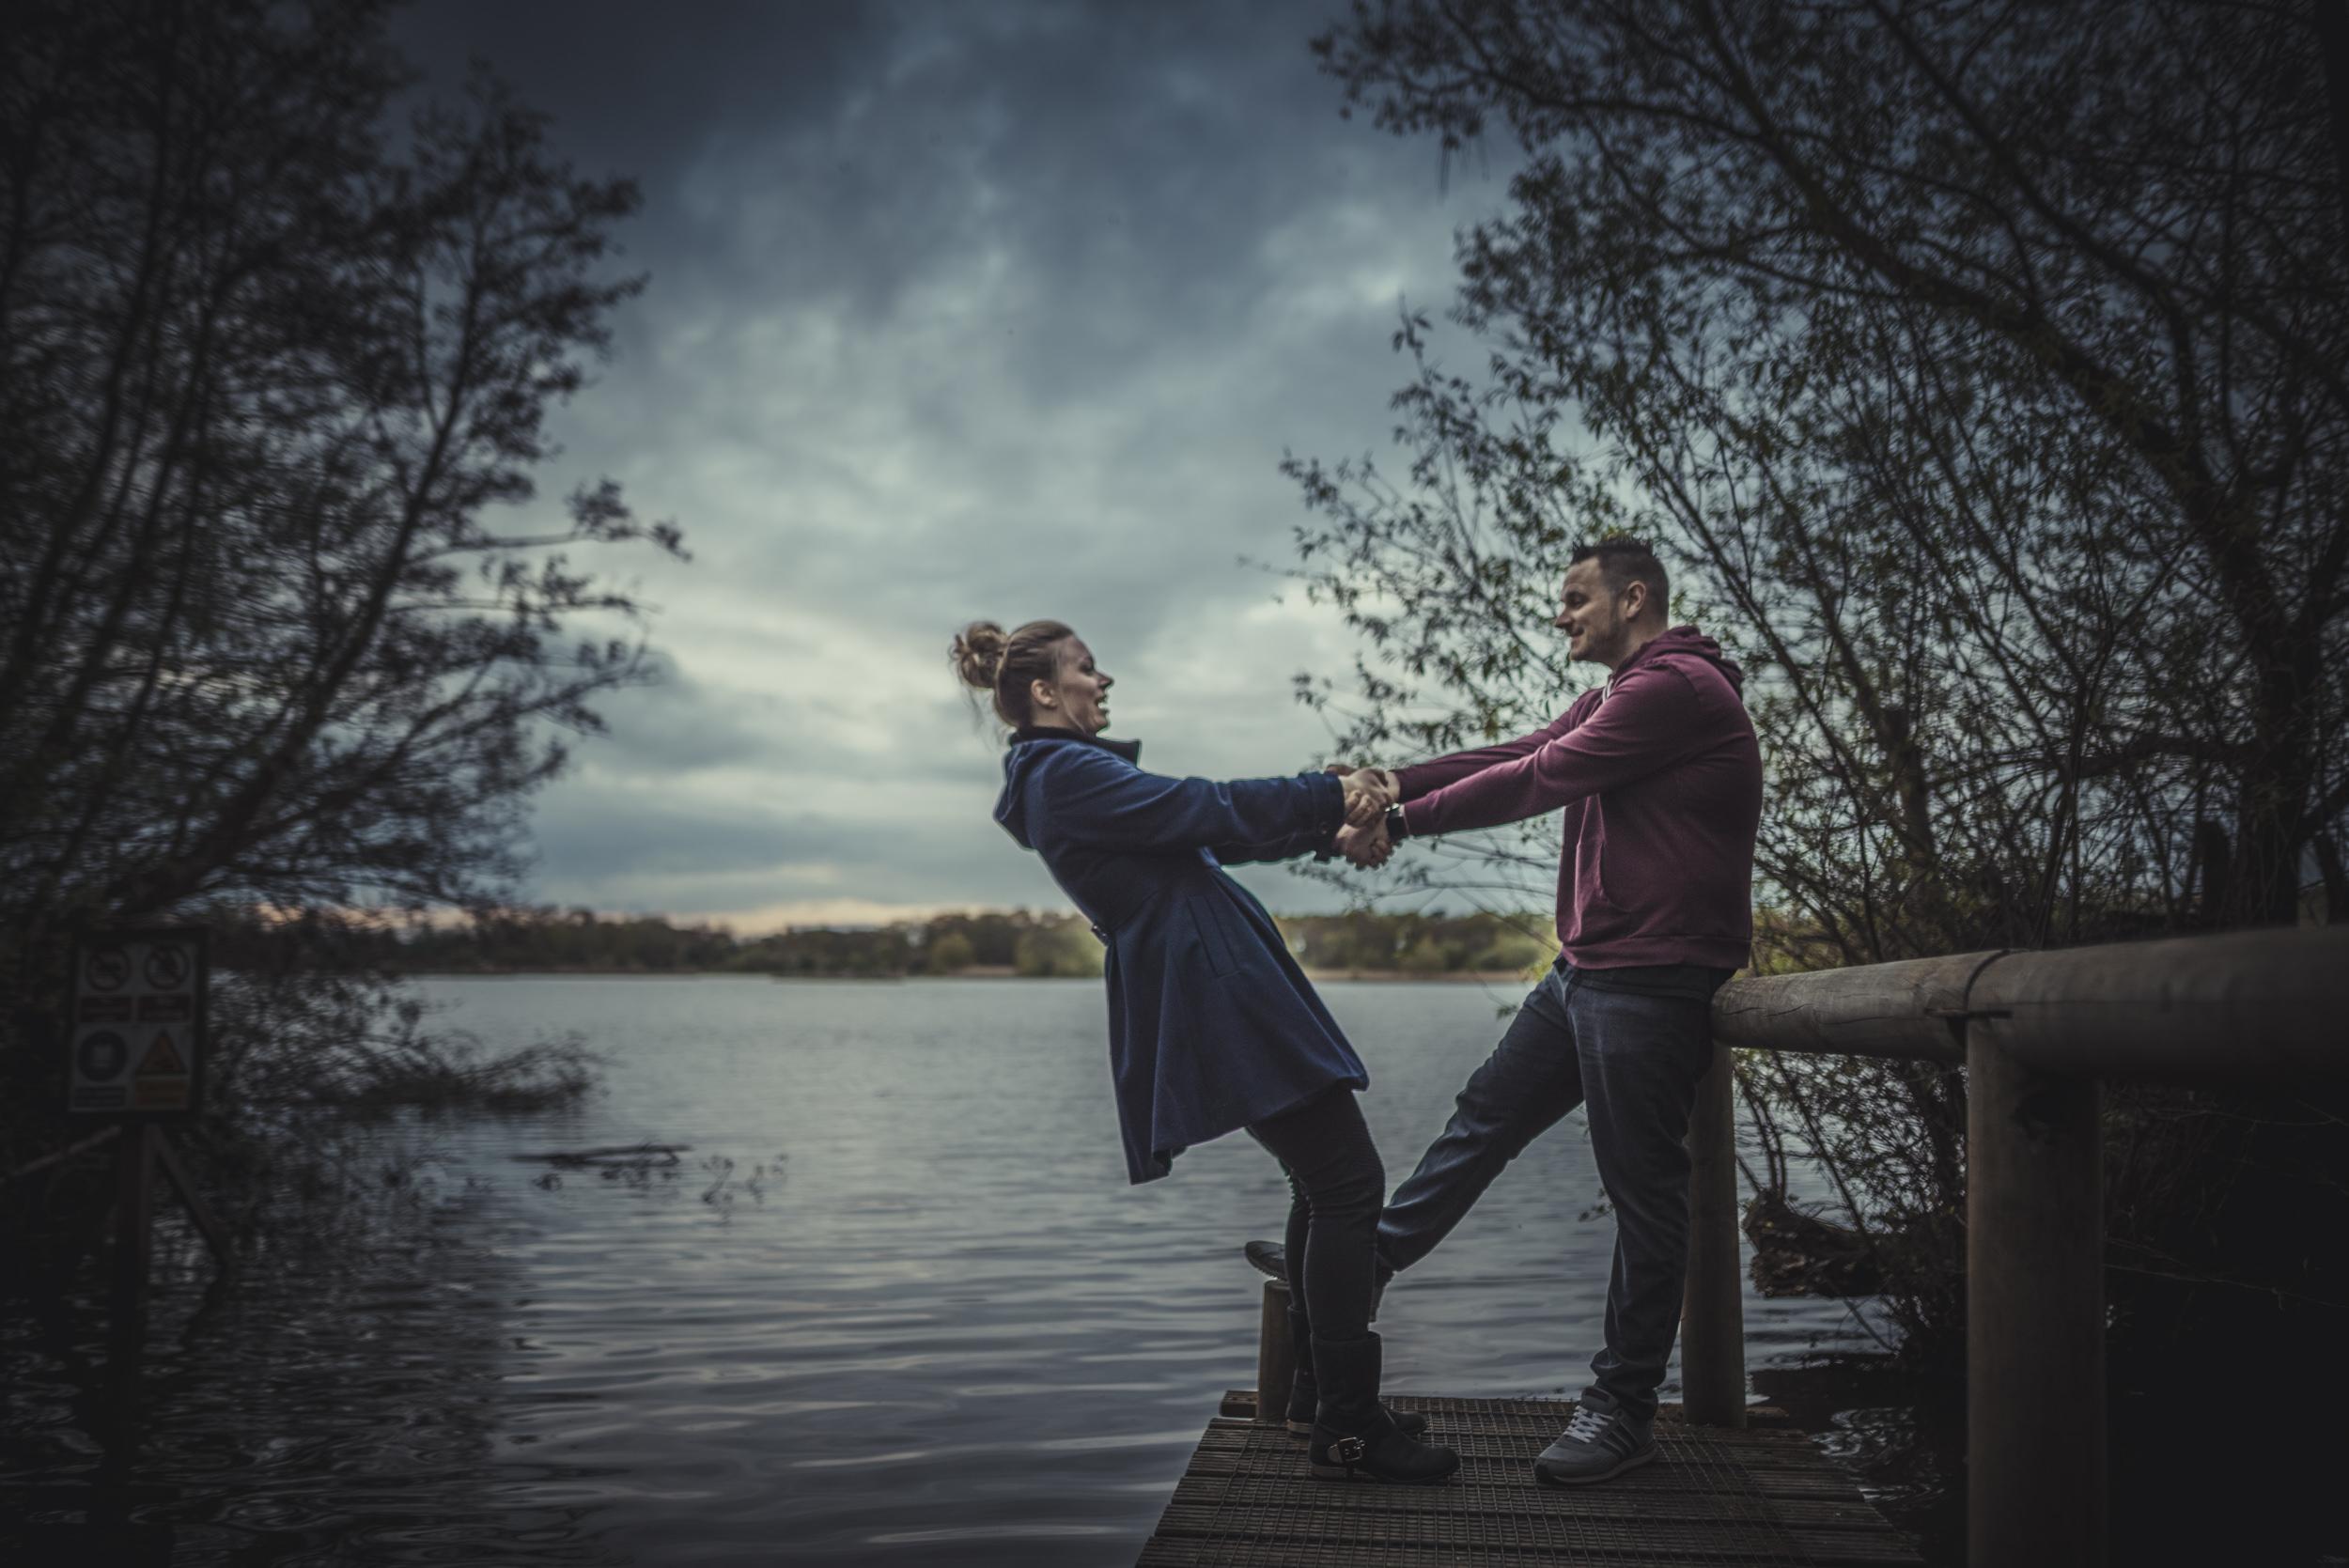 Hannah-and-Sam-Engagement-Sesion-in-Fleet-Pond-Hampshire-Manu-Mendoza-Wedding-Photography-100.jpg